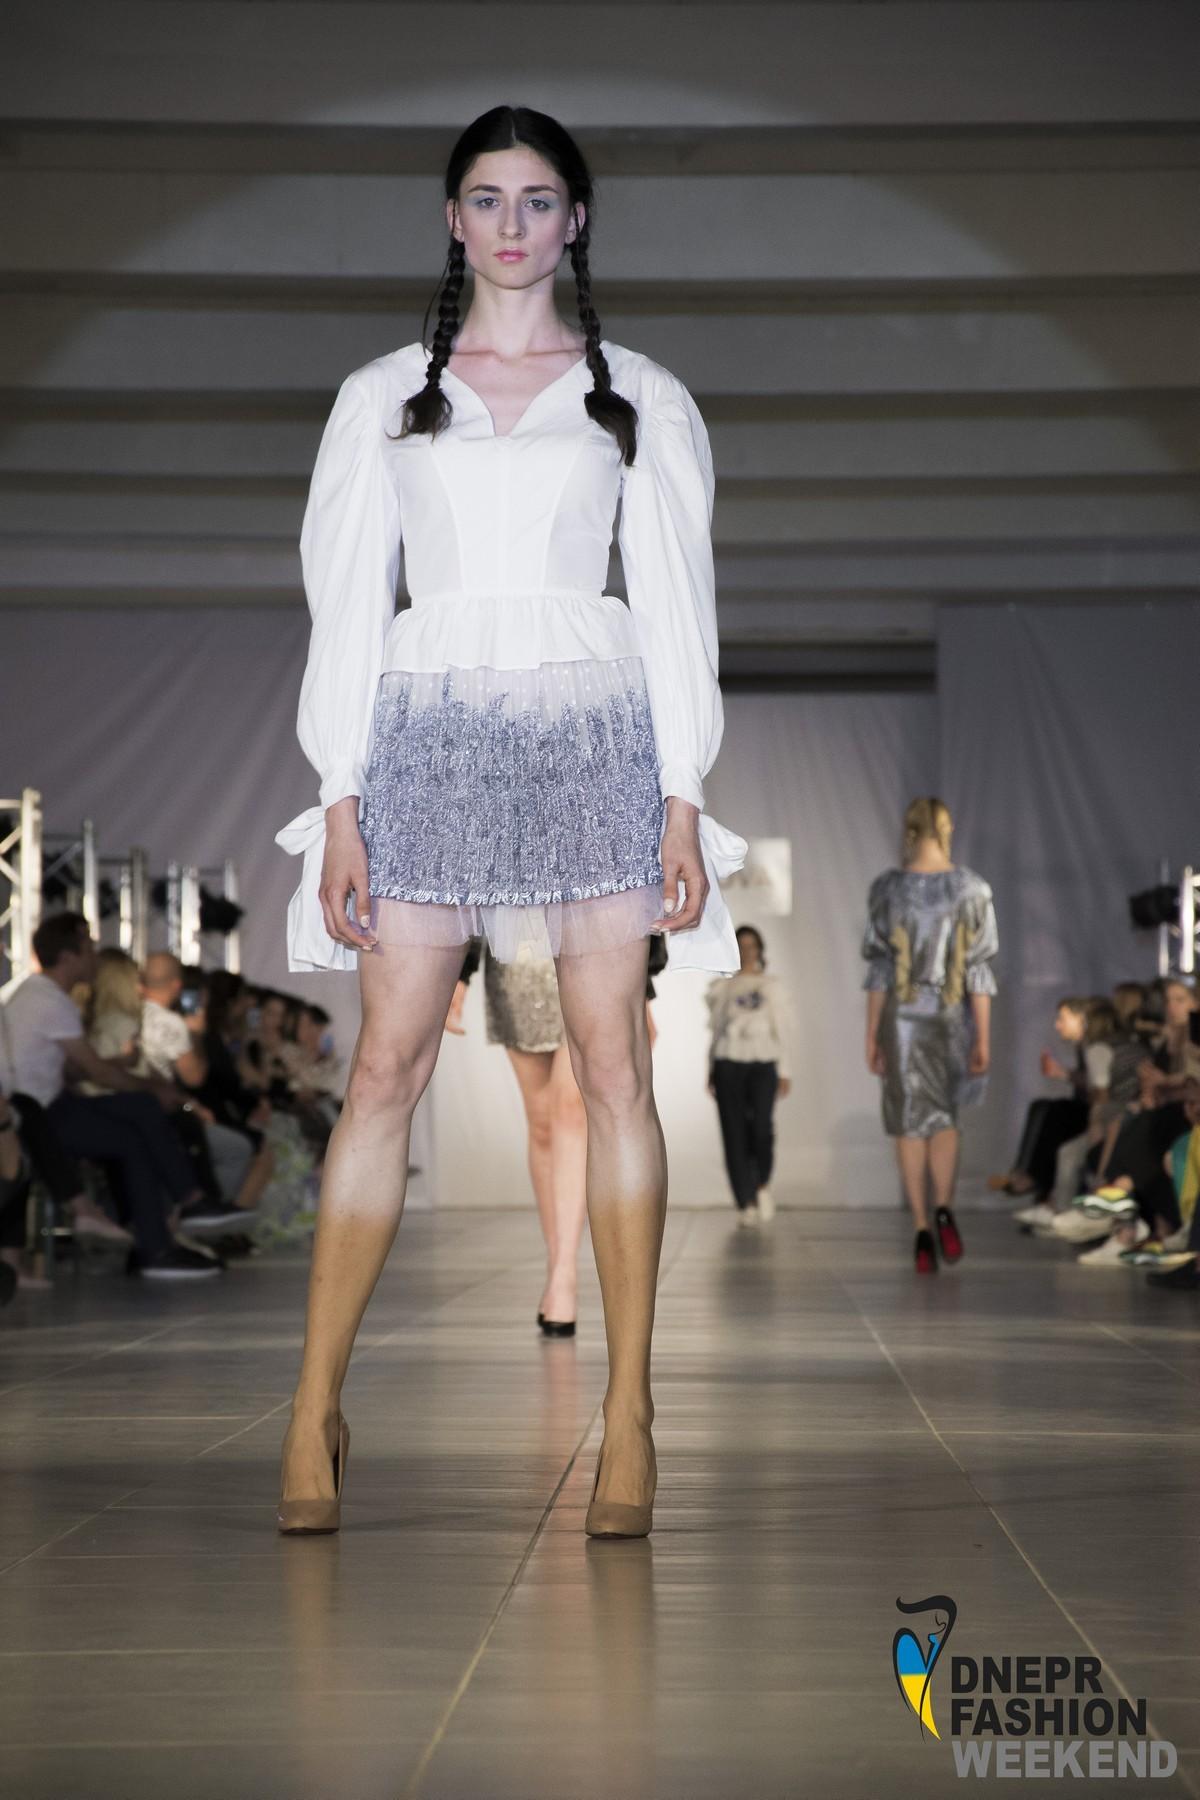 SEREBROVA_ Хроники Dnepr Fashion Weekend как прошли три дня модного мероприятия